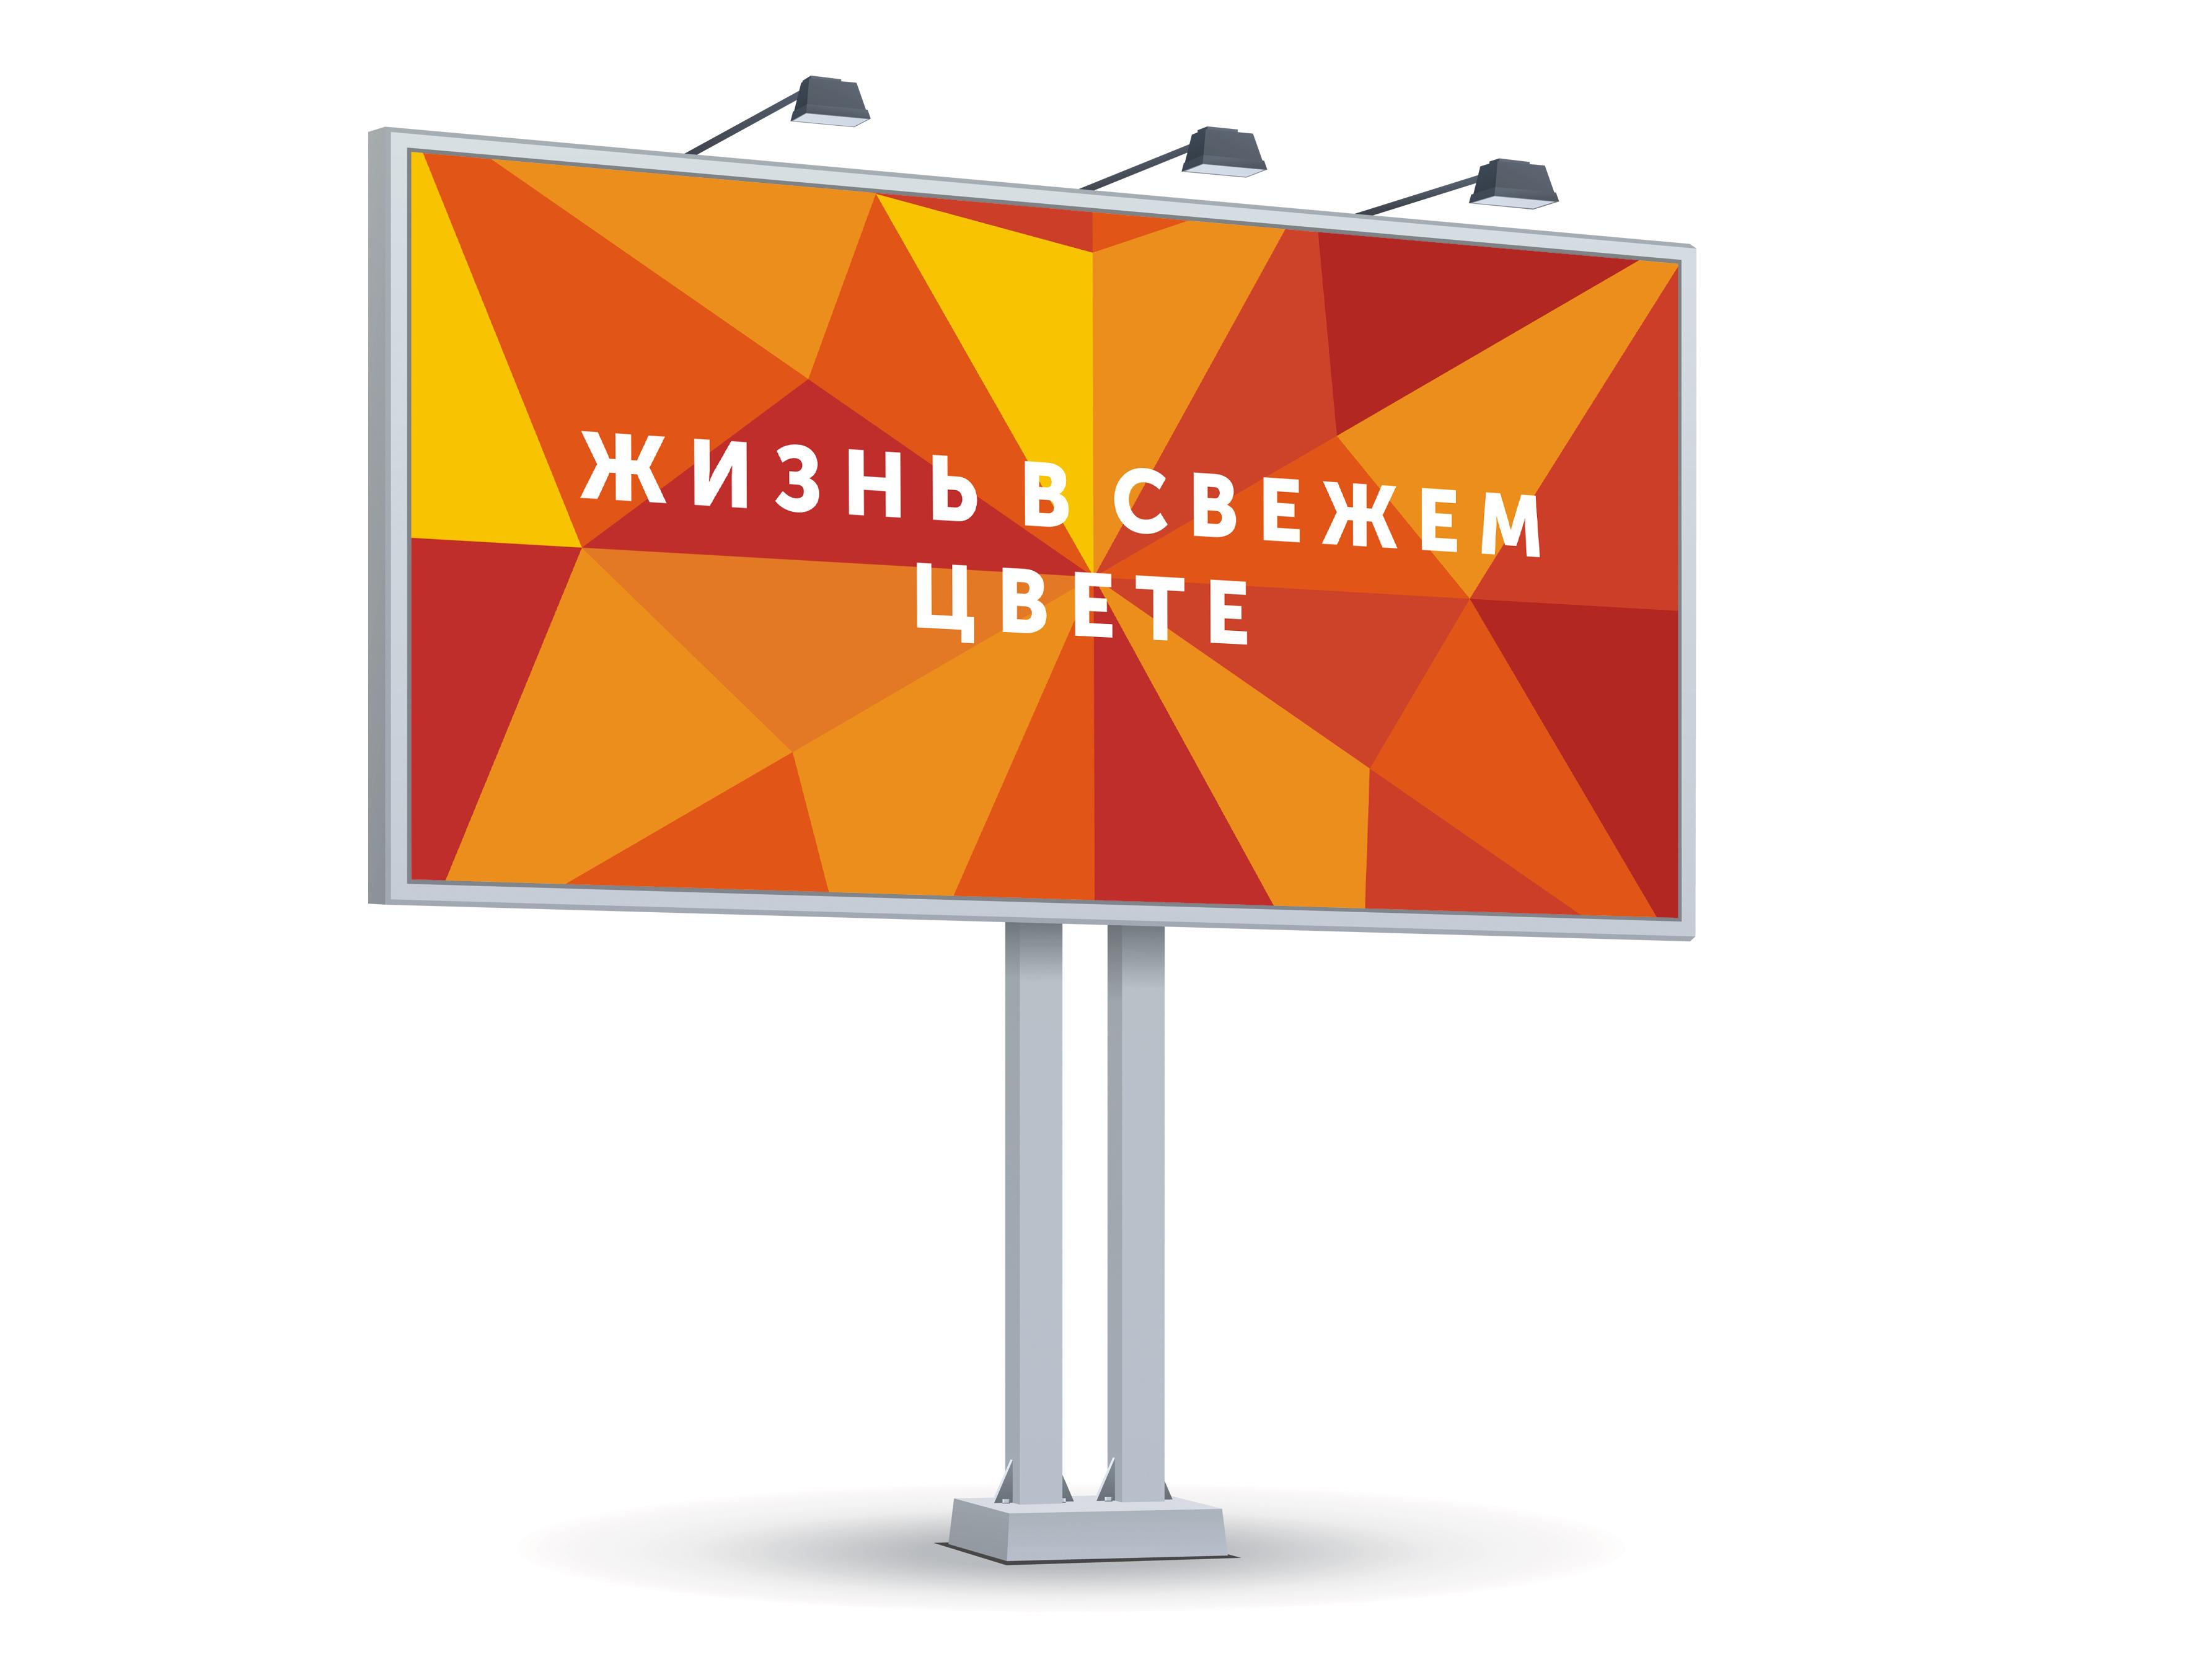 Логотип и фирменный стиль фото f_4955a673bdee8f8c.jpg